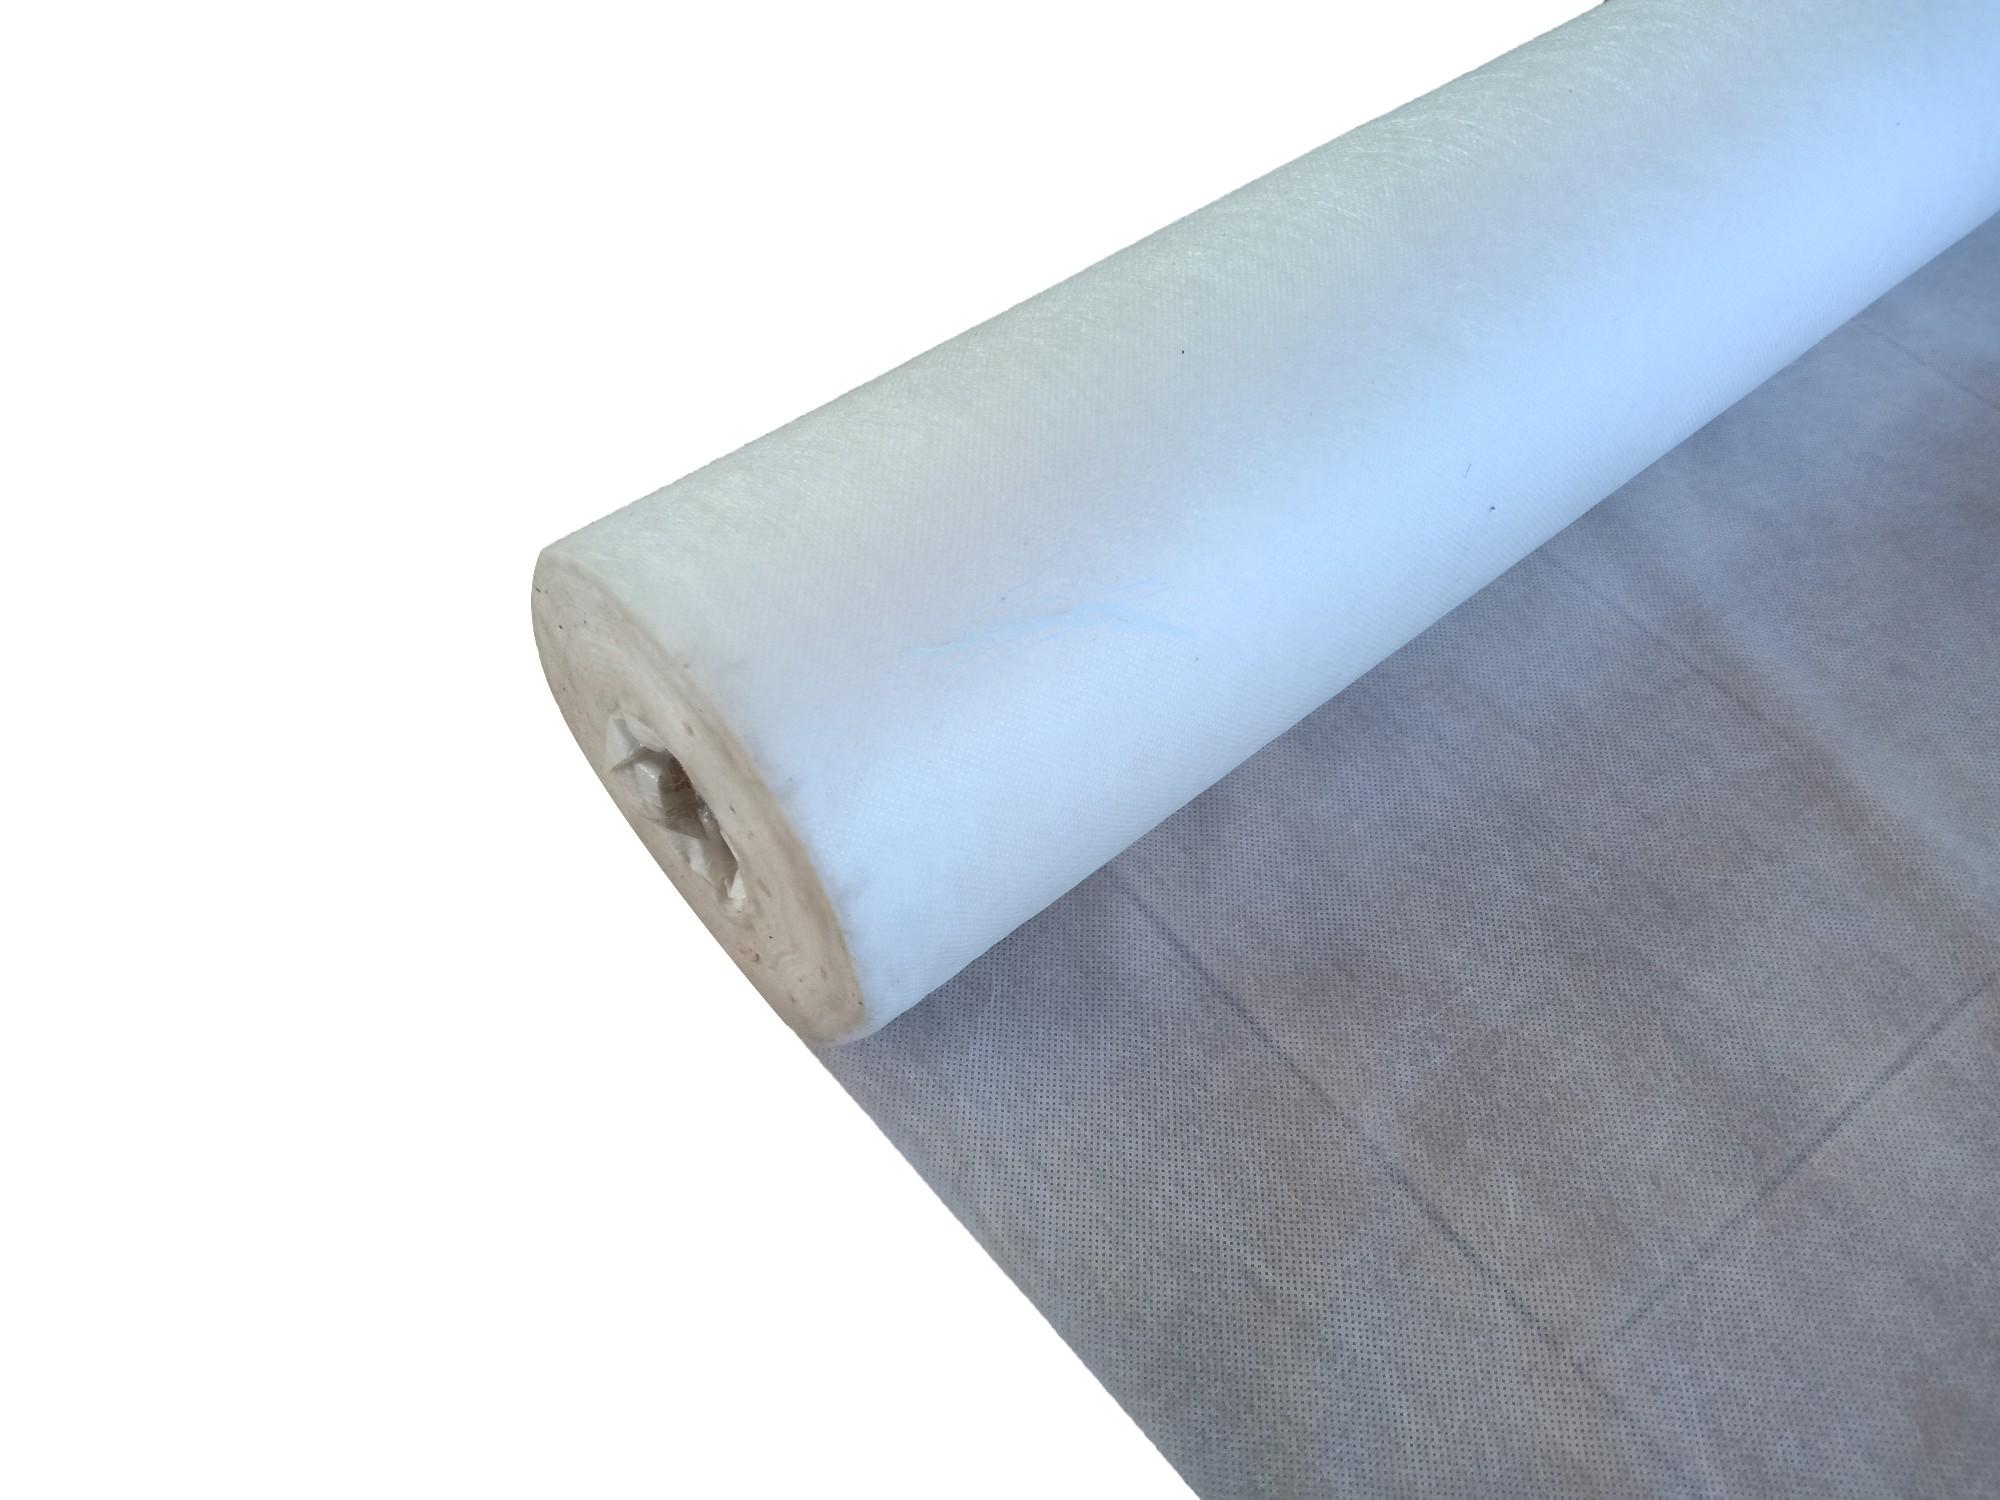 Basic Vapor Barrier Manufacturers, Basic Vapor Barrier Factory, Supply Basic Vapor Barrier